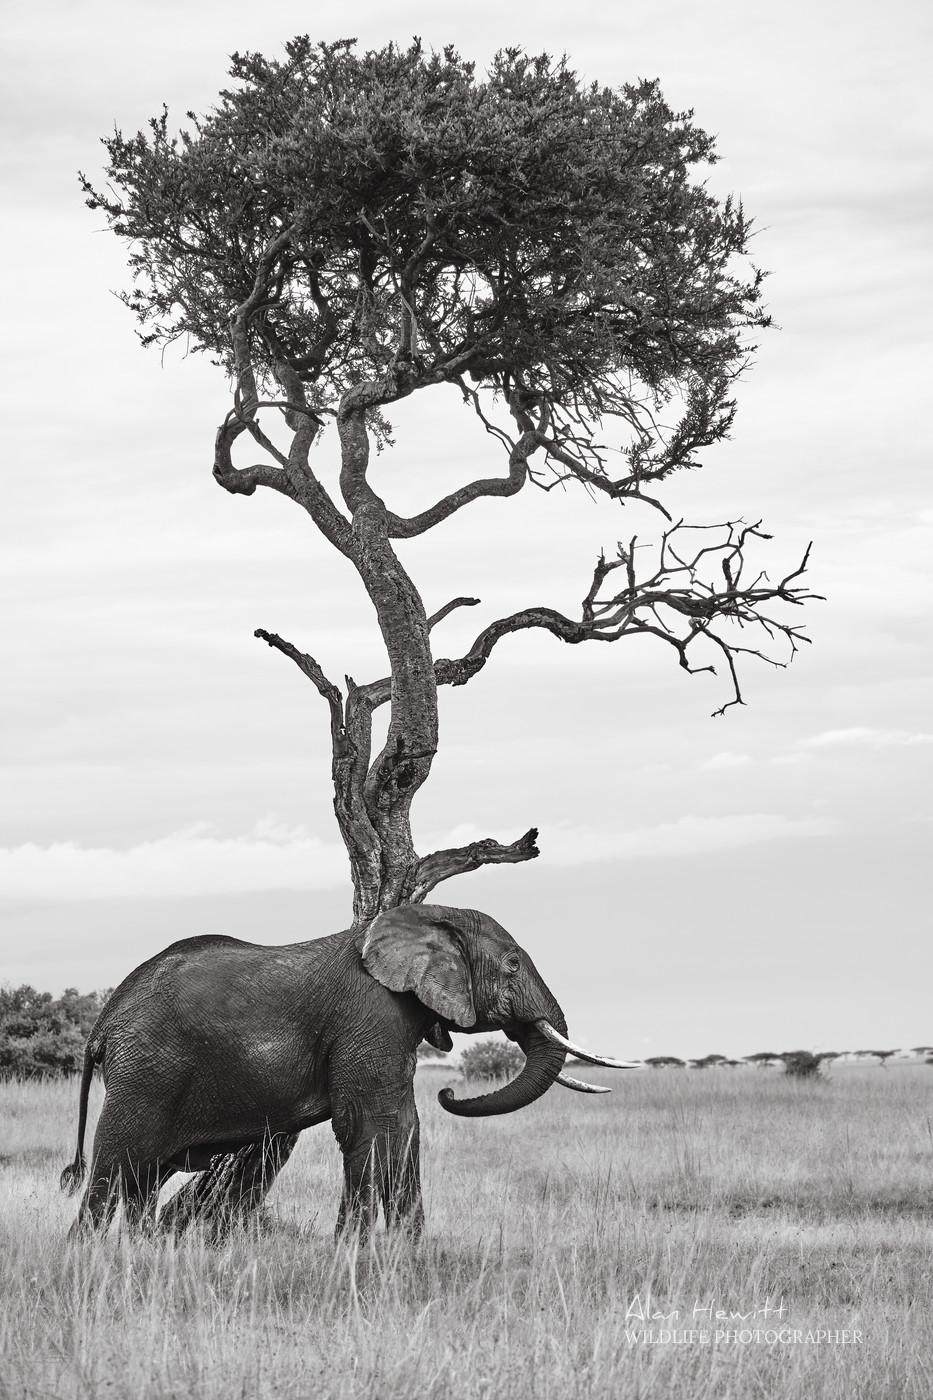 Elephant Masai Mara Alan Hewitt Photography